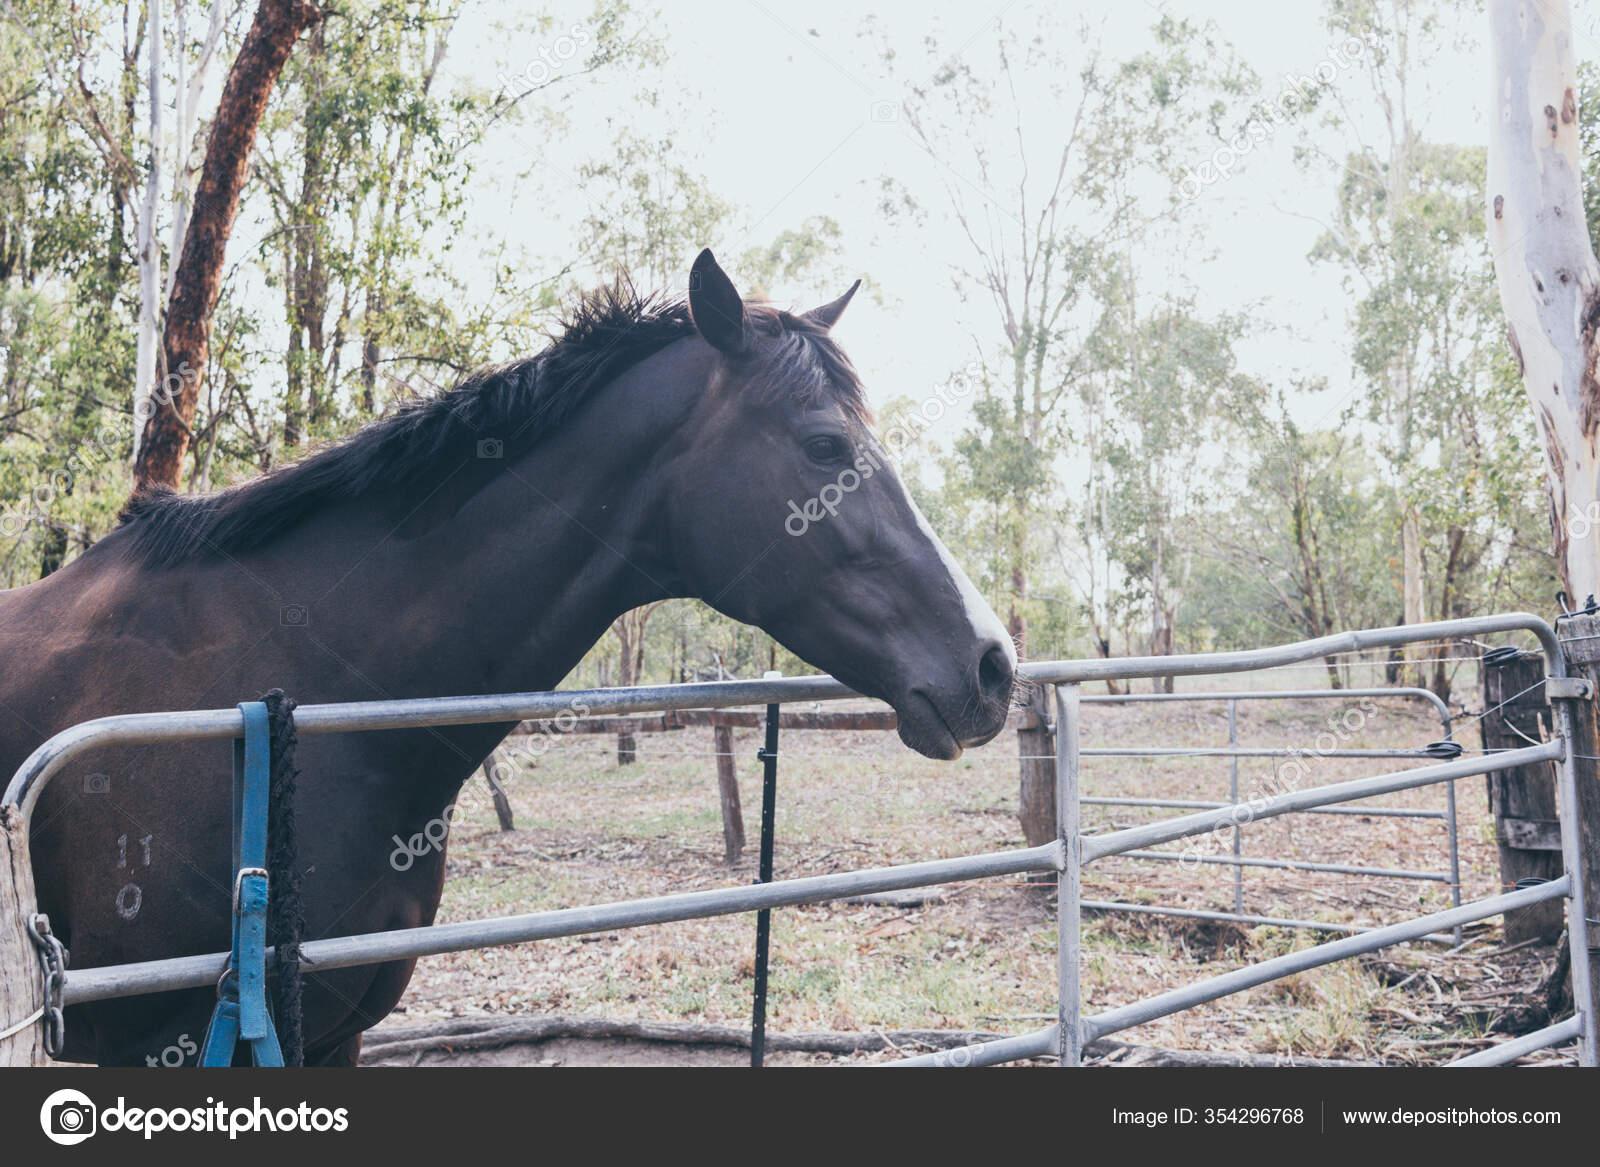 Beautiful Black Horse White Stain Forehead Wild Ranch Spanish Horse Stock Photo C Yaizahigueras 354296768